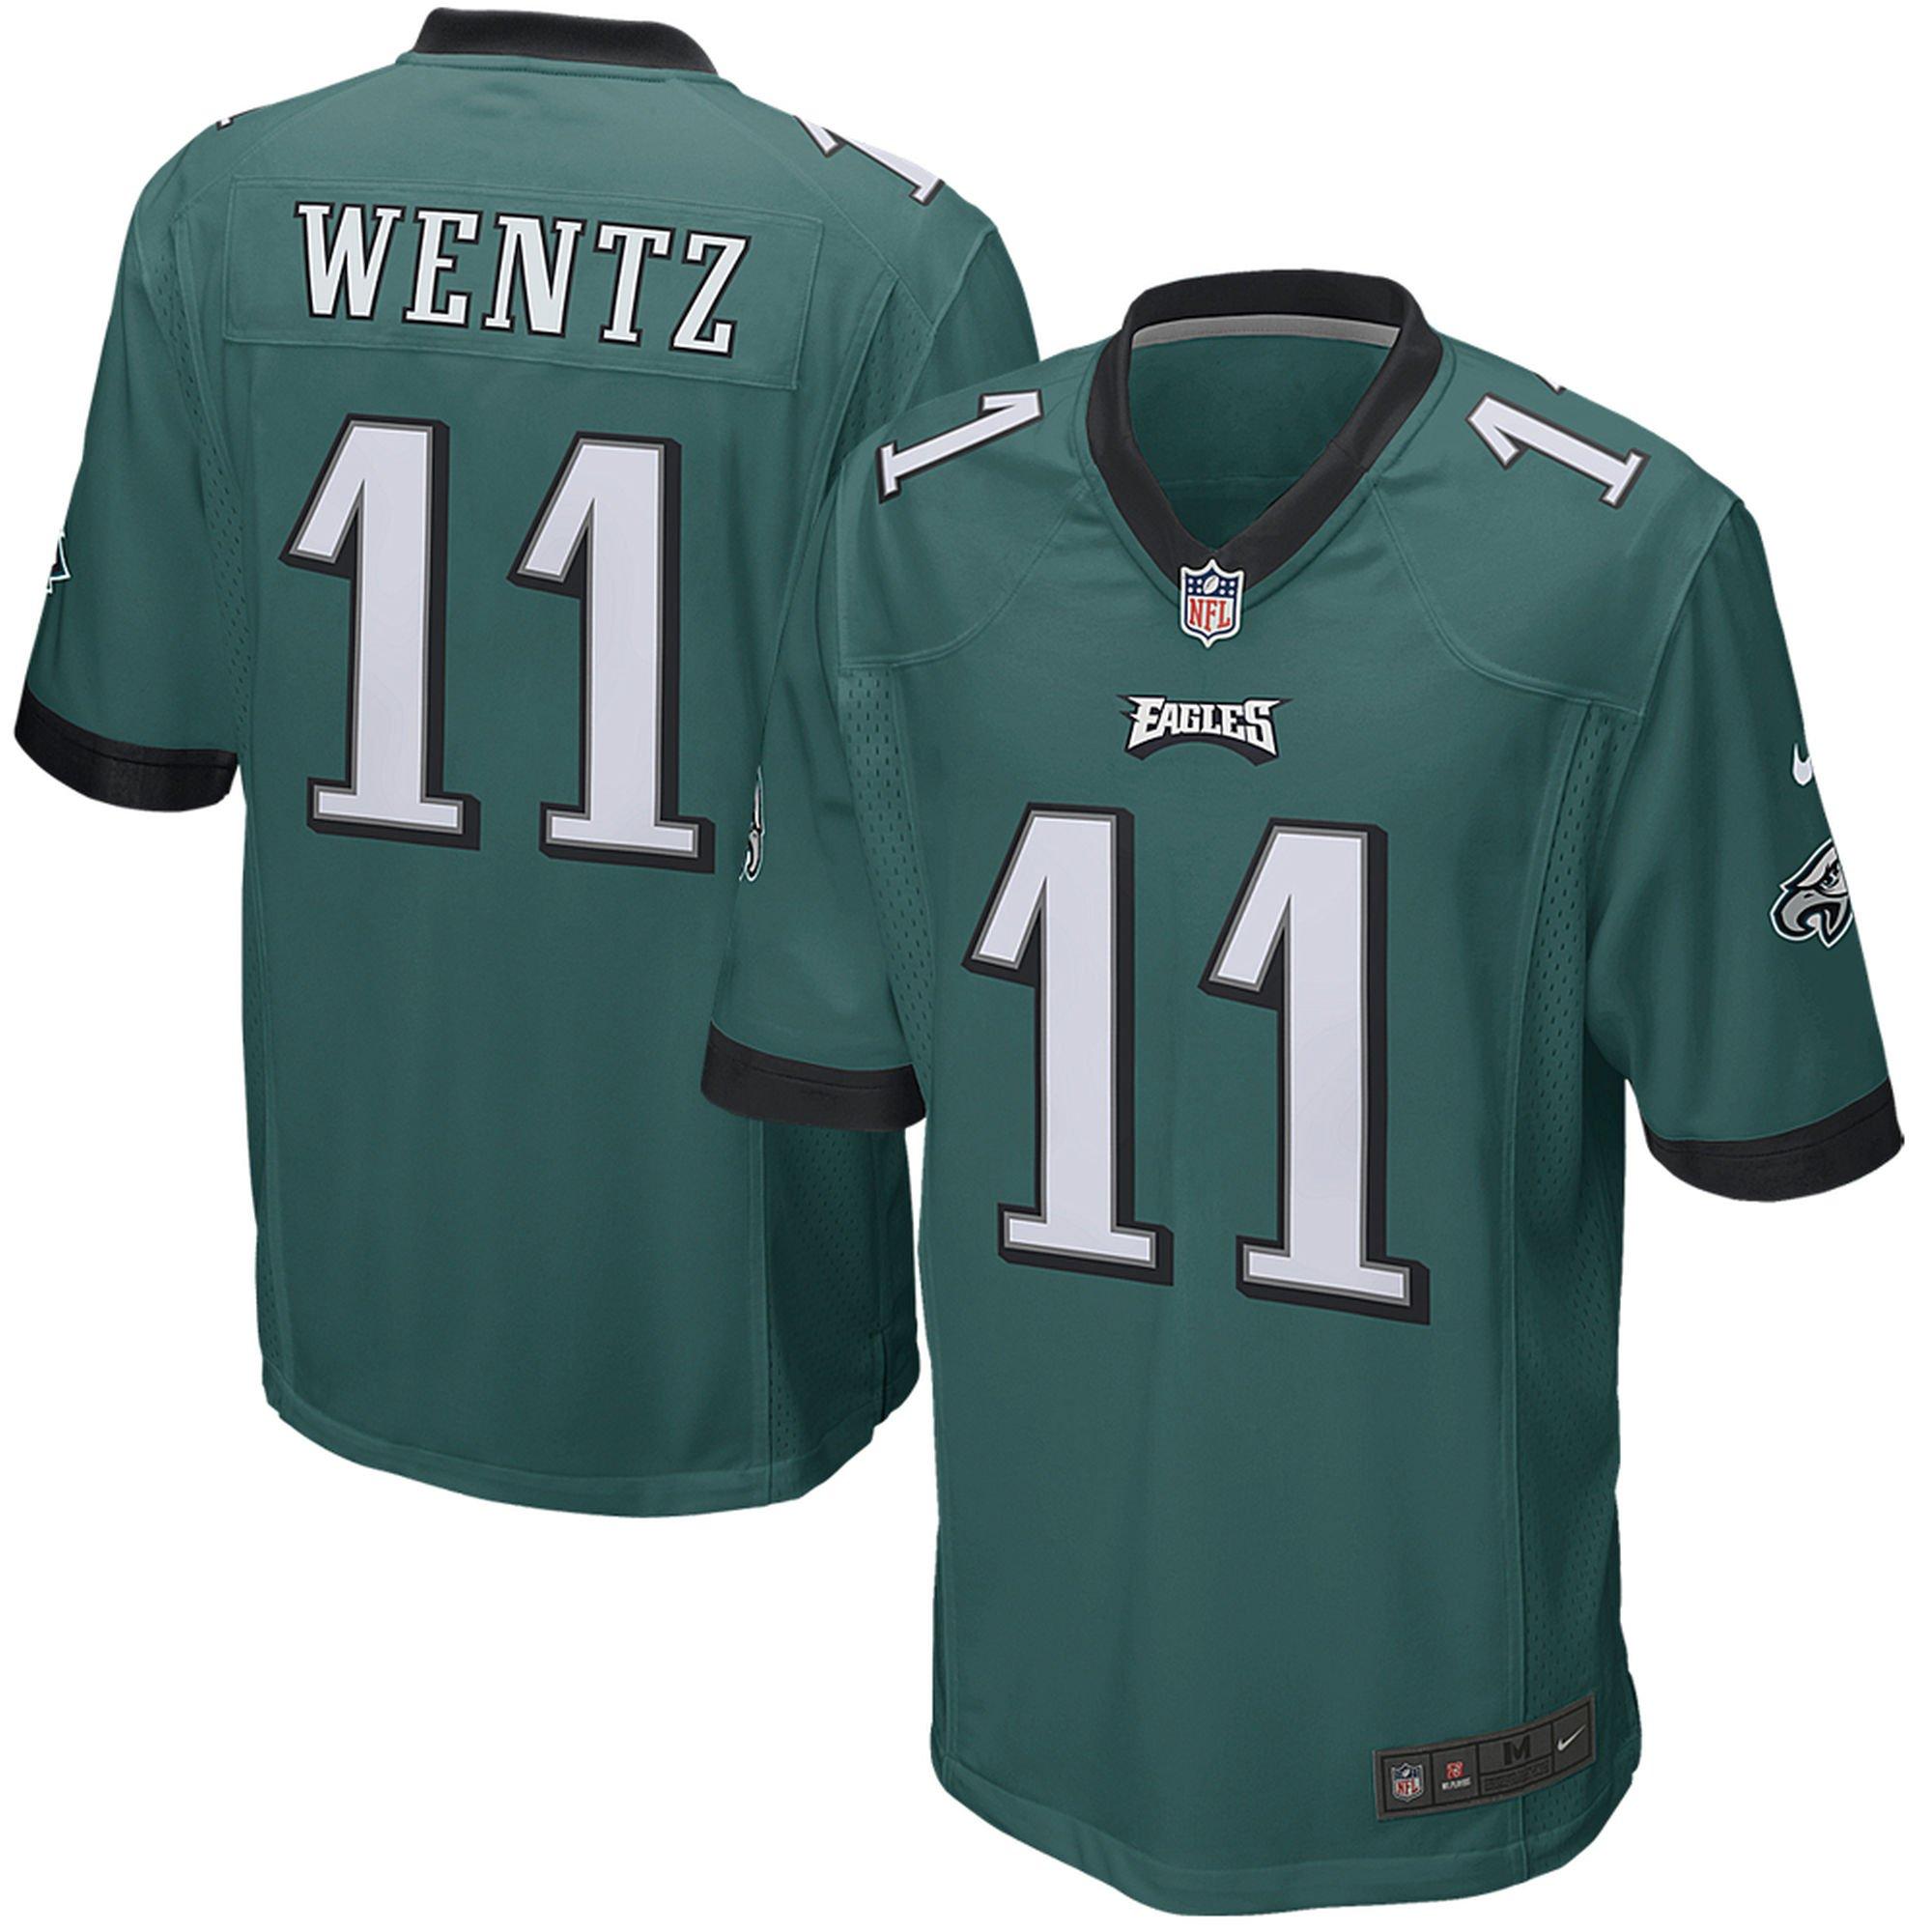 Carson Wentz Philadelphia Eagles Nike Green Game Jersey - Men's Medium by NIKE